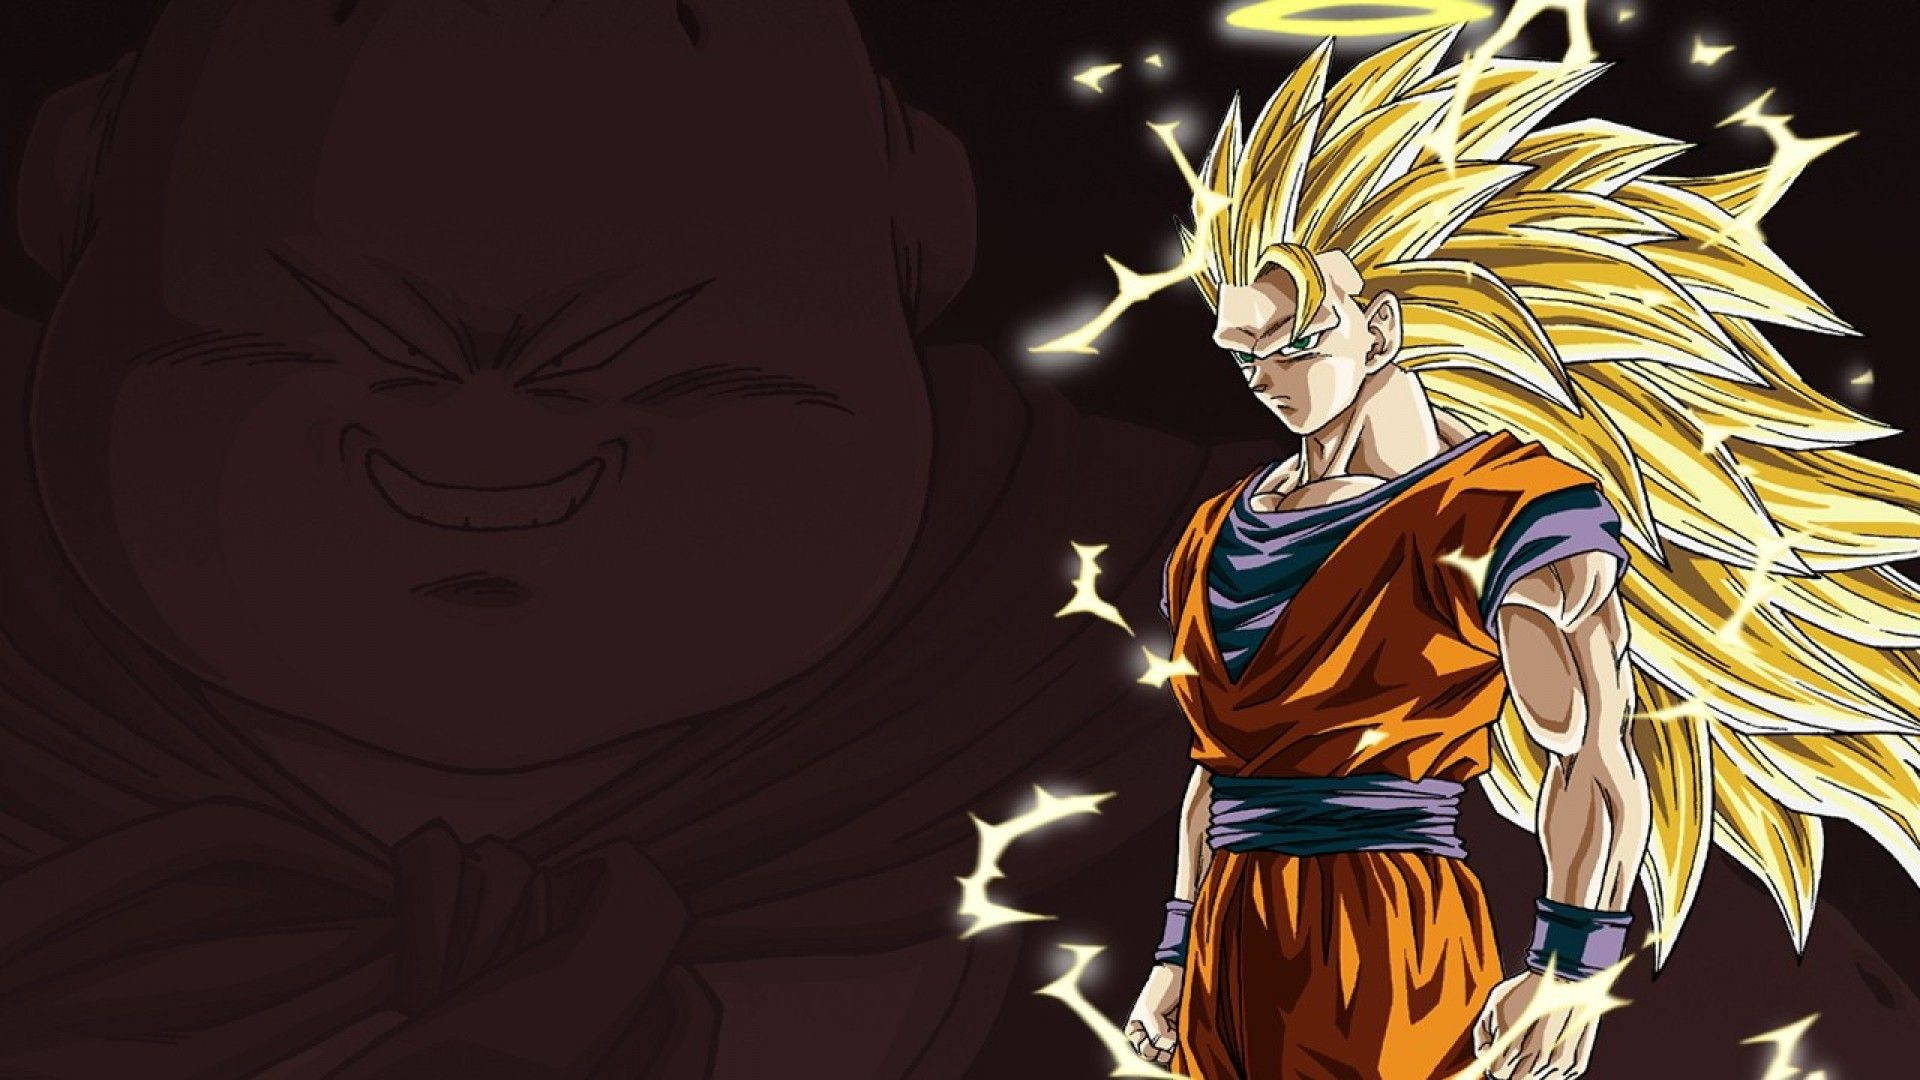 HD Super Saiyan 3 Goku Computer Wallpaper – HiReWallpapers 877